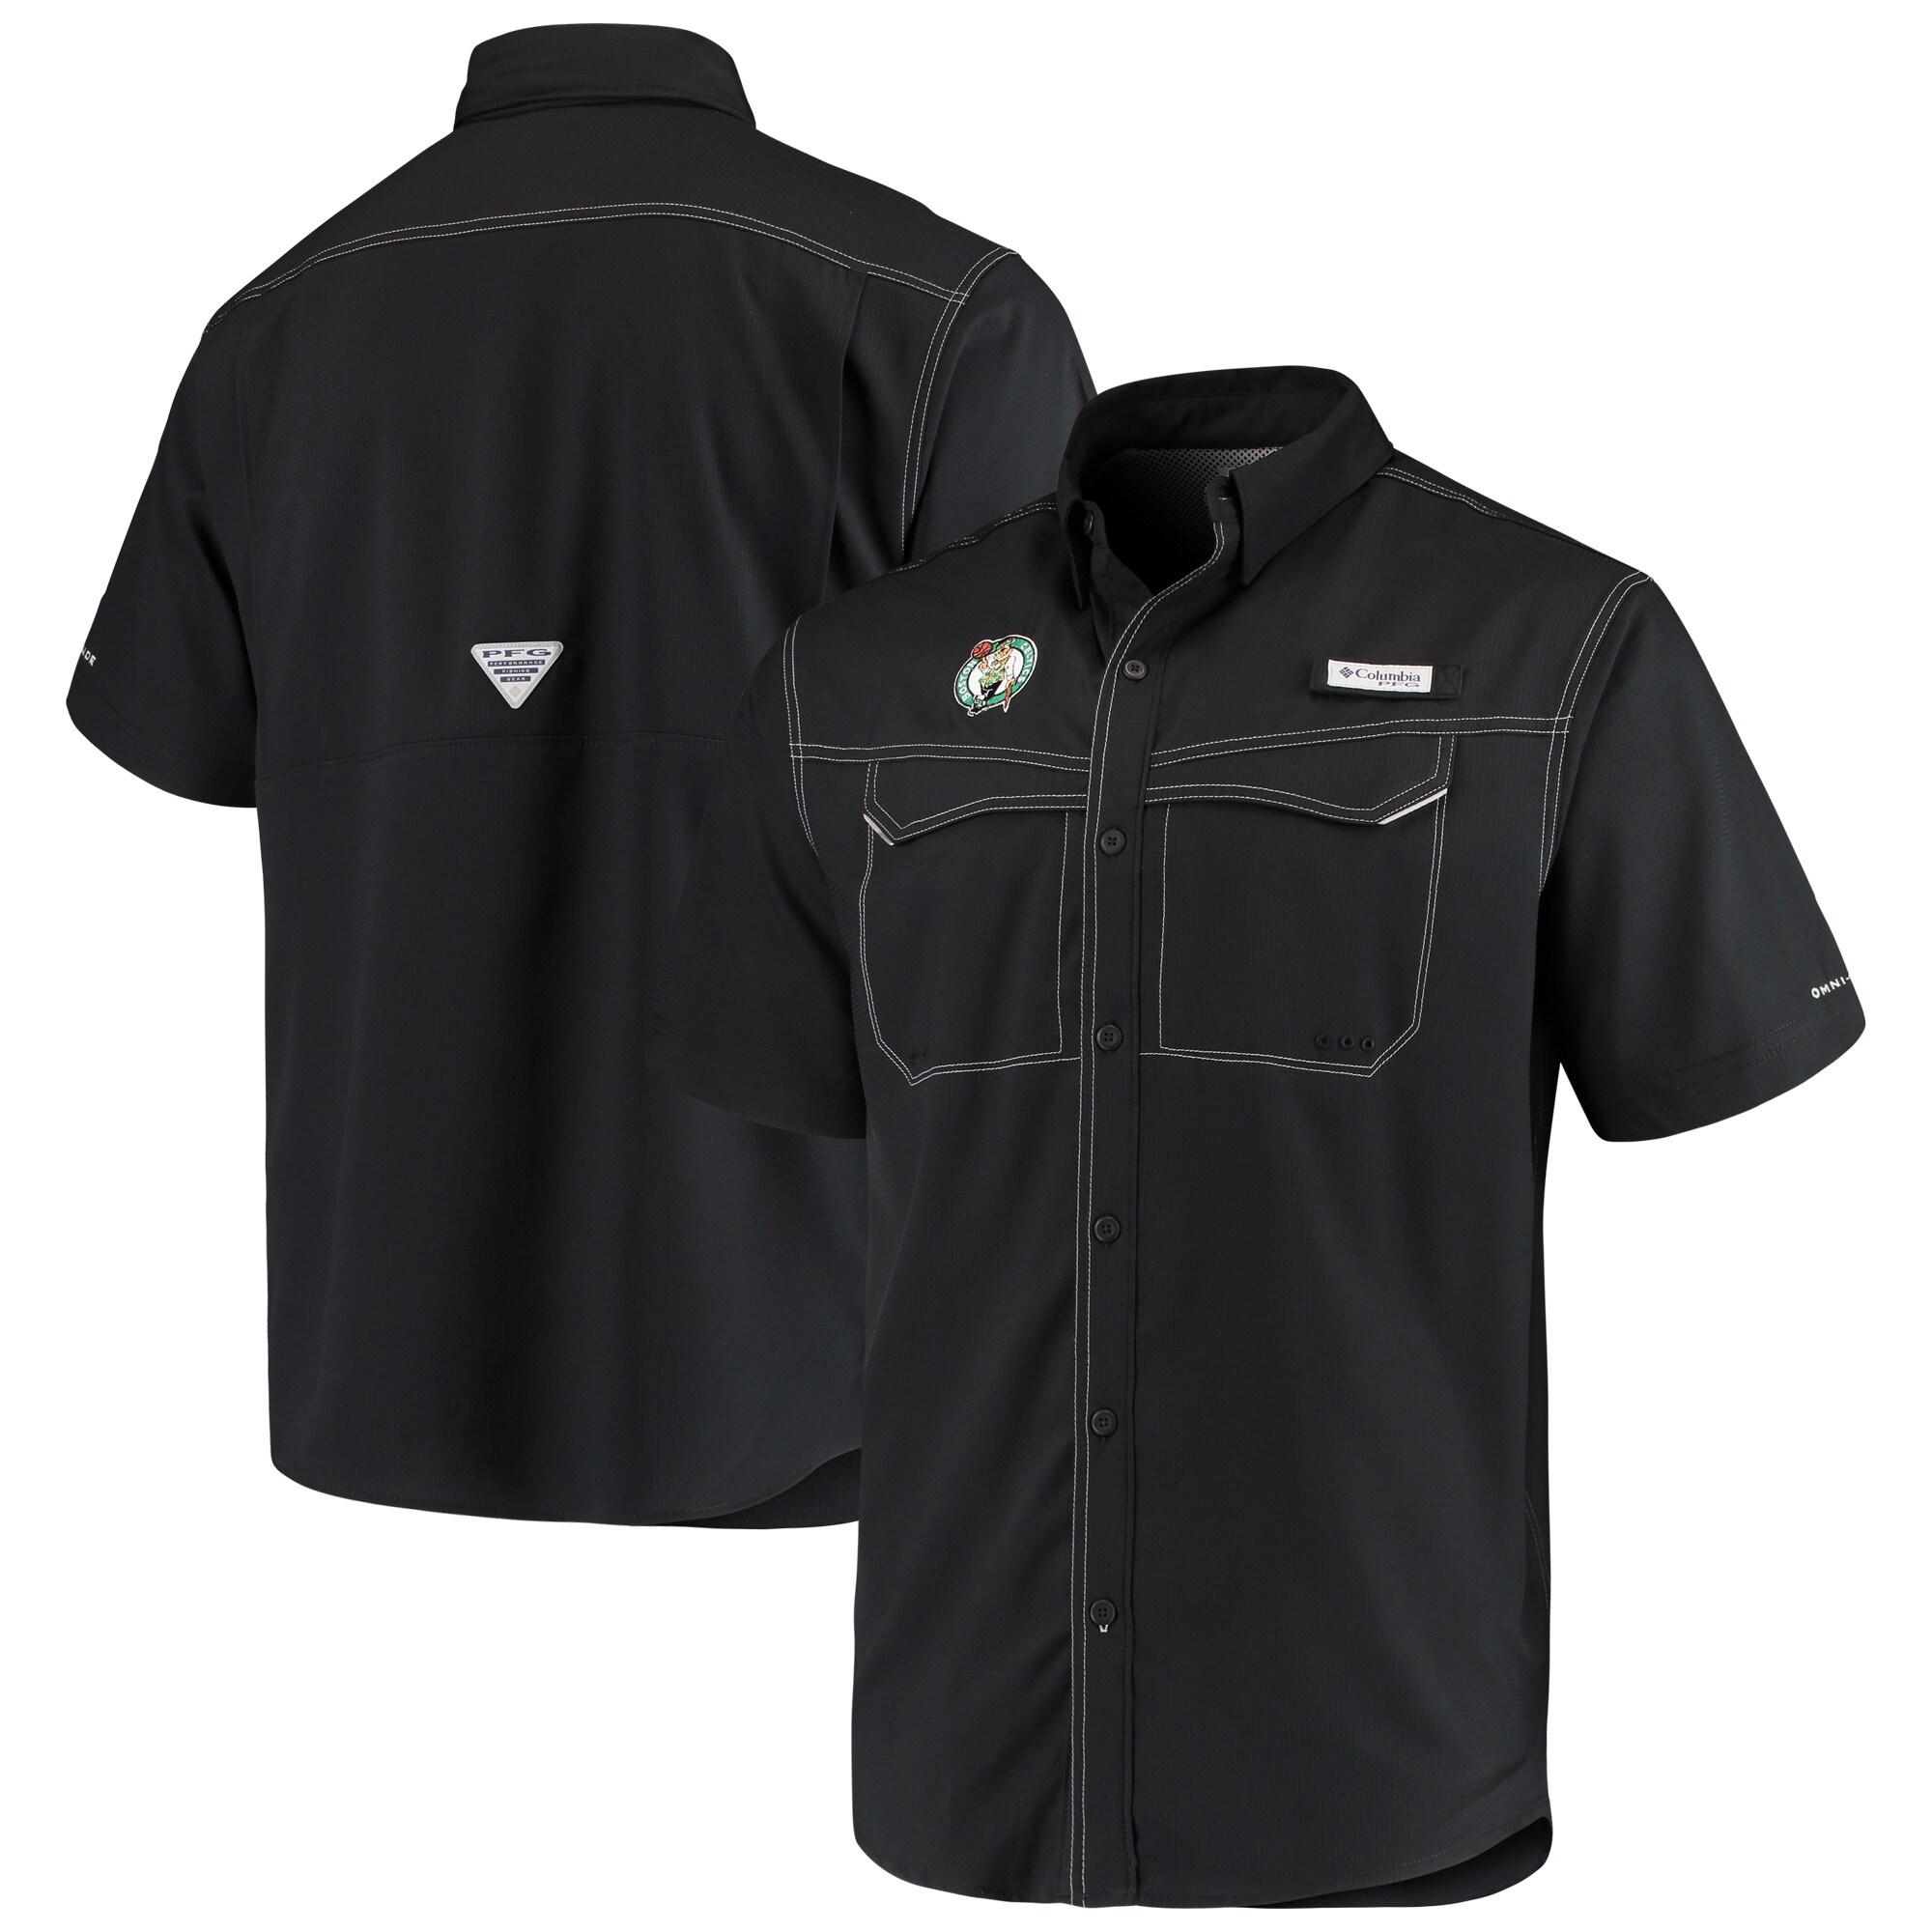 Boston Celtics Columbia Low Drag Offshore Omni-Shade Button-Up Shirt - Black